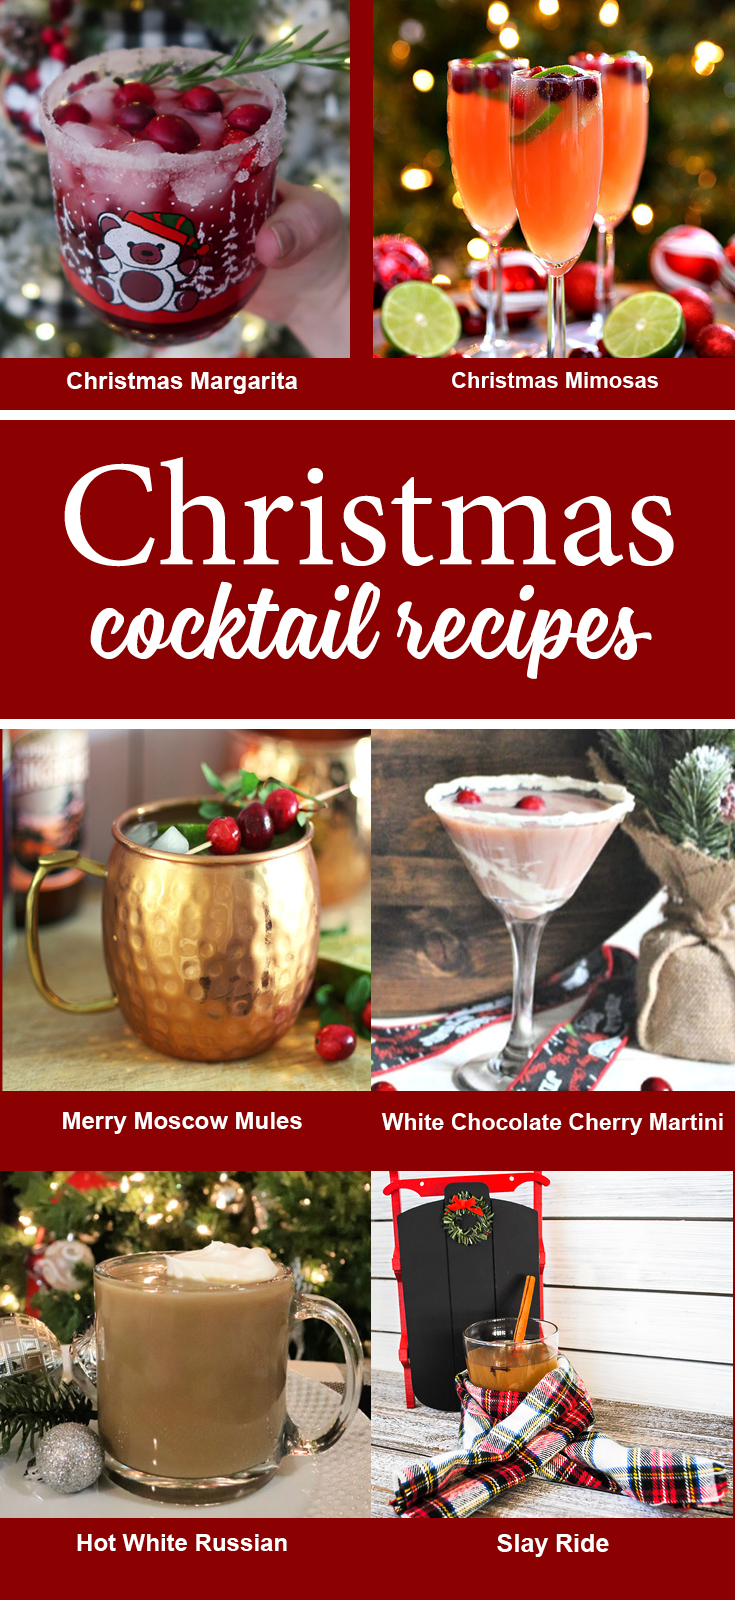 6 Christmas Cocktails